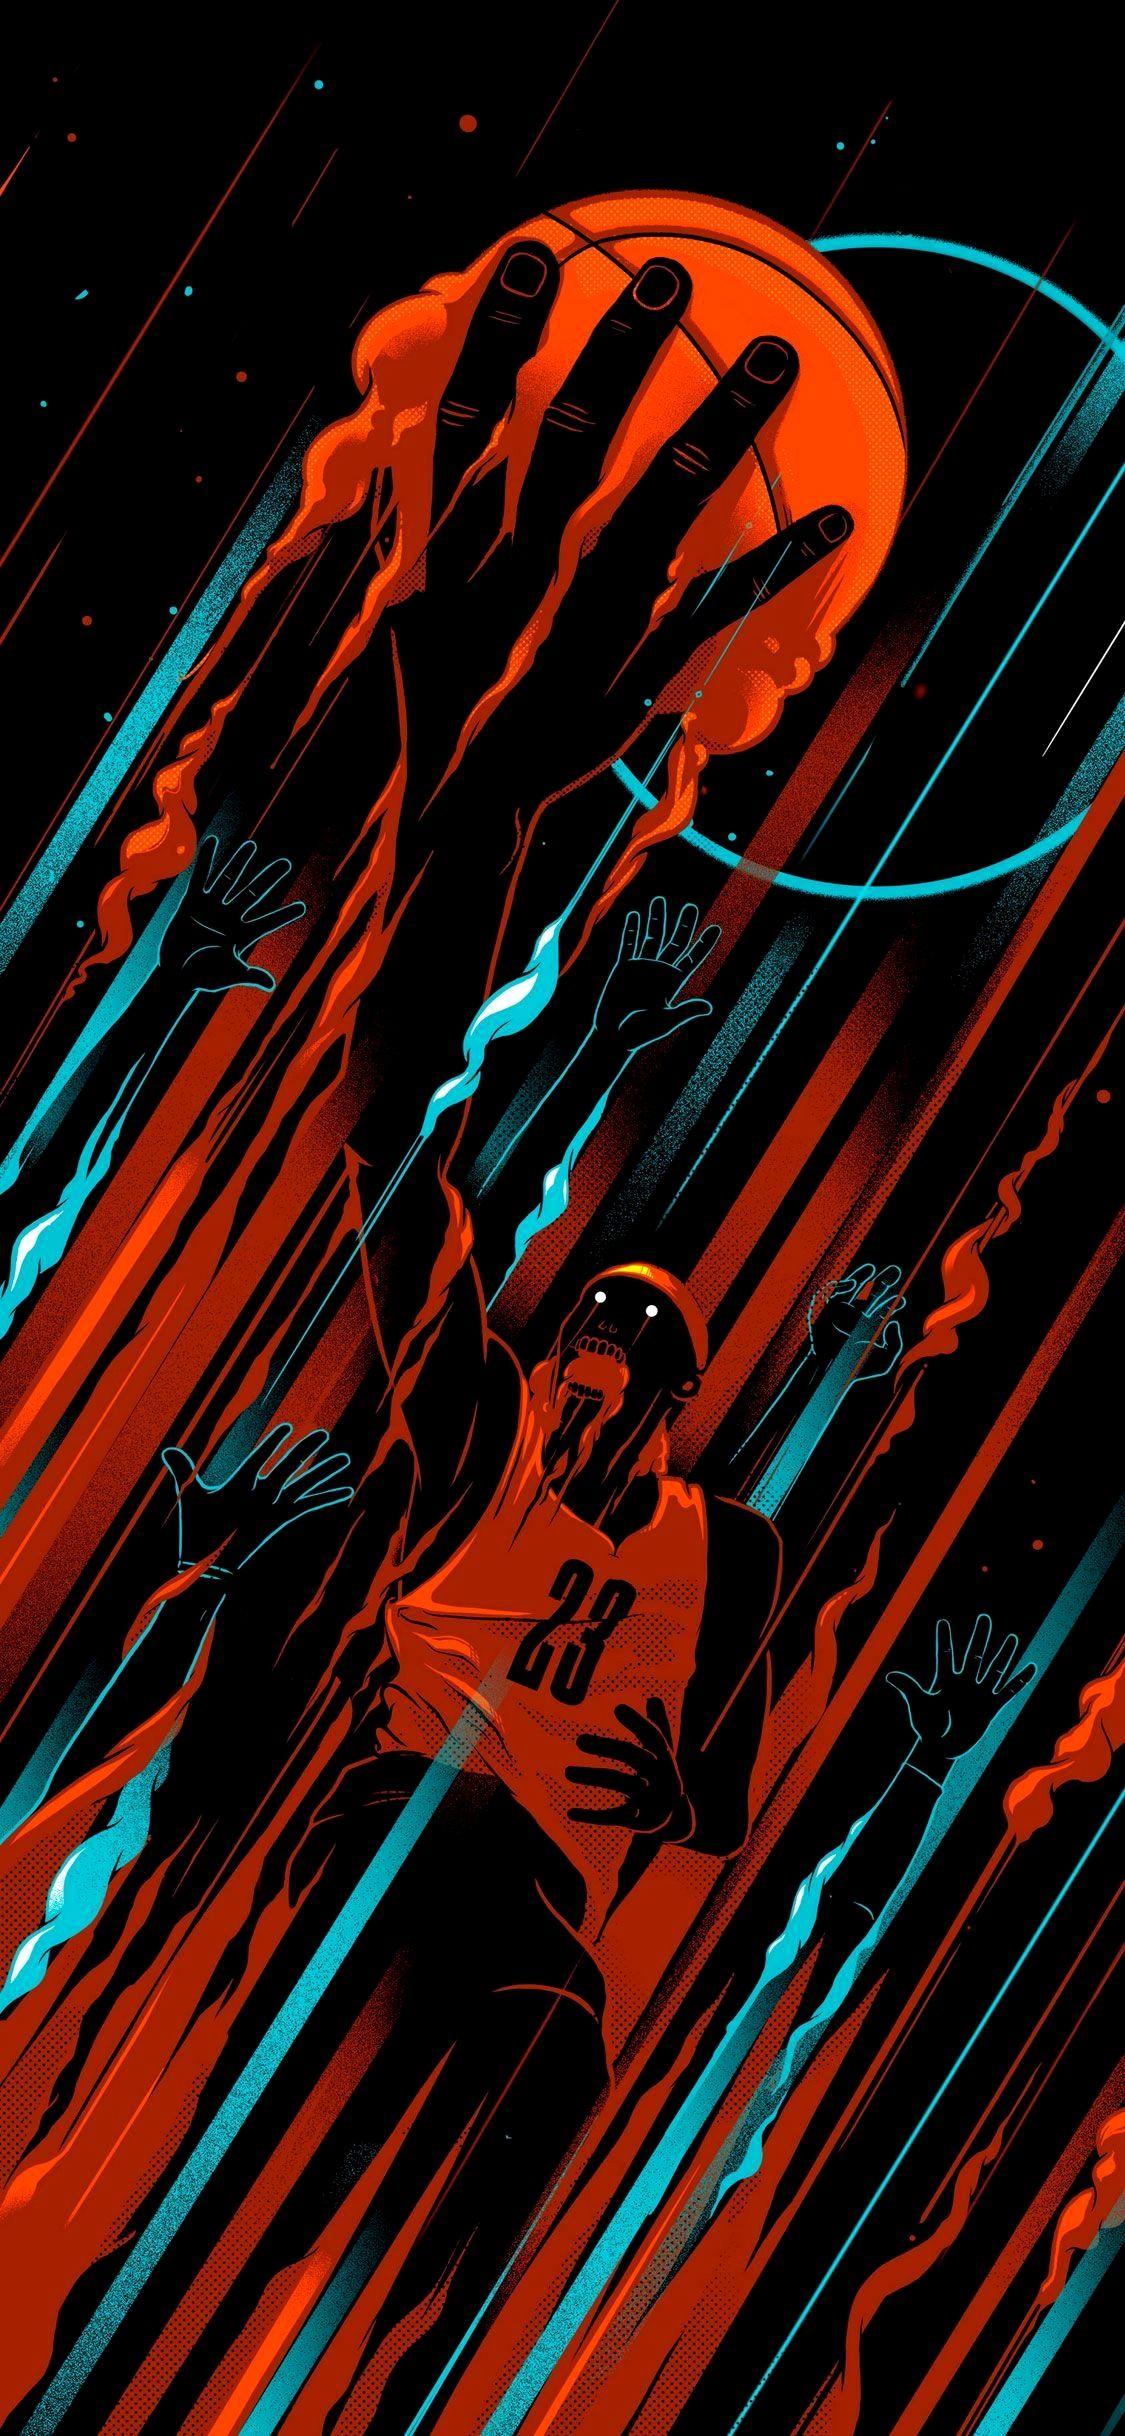 Nba Wallpaper 4k Iphone Trick Basketball Iphone Wallpaper Basketball Wallpaper Cool Backgrounds For Iphone